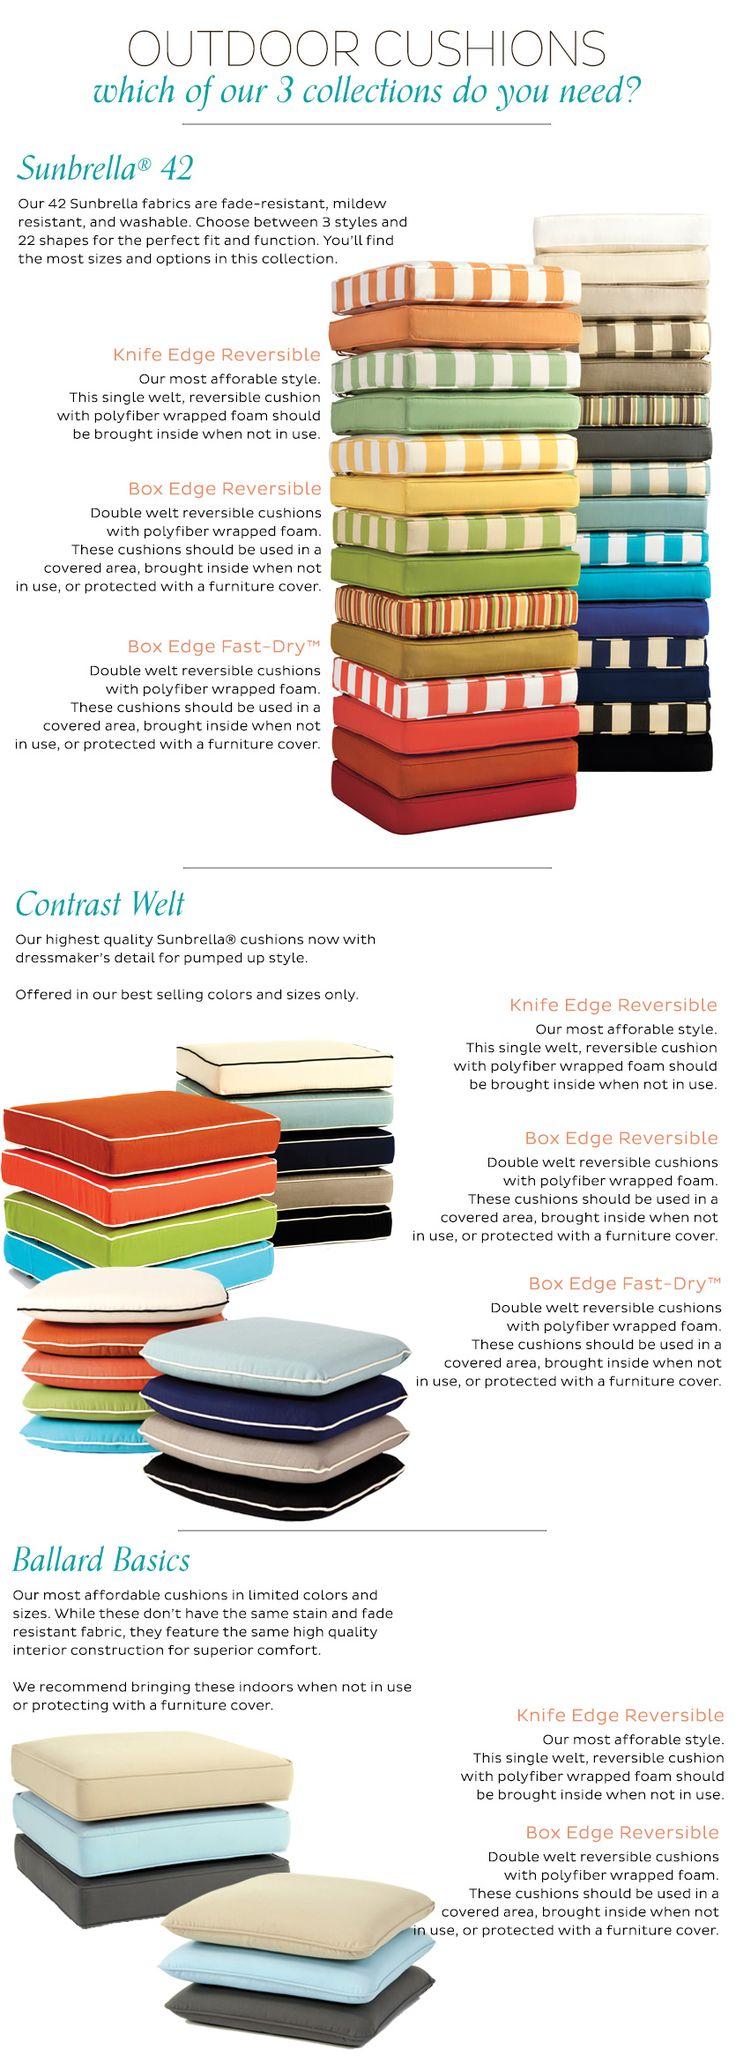 Outdoor cushion options from Ballard Designs -- Sunbrella cushions, contrast welt, and basic cushions